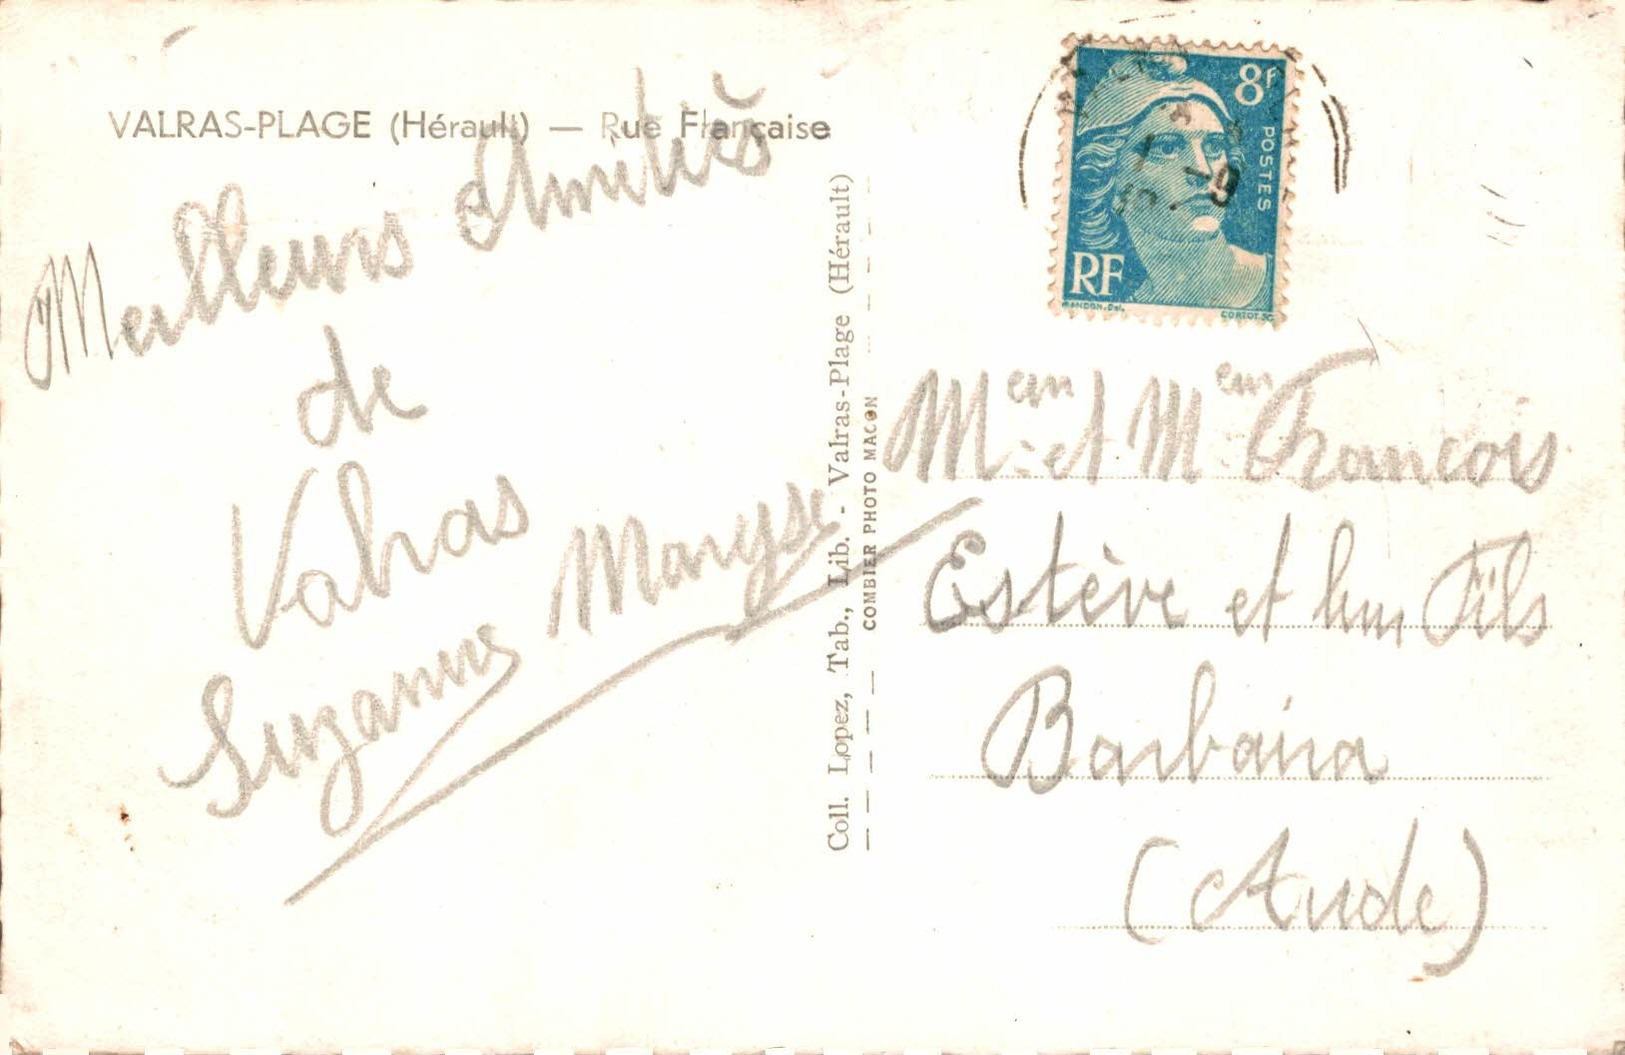 792-2019     VALRAS PLAGE   RUE FRANCAISE - Francia